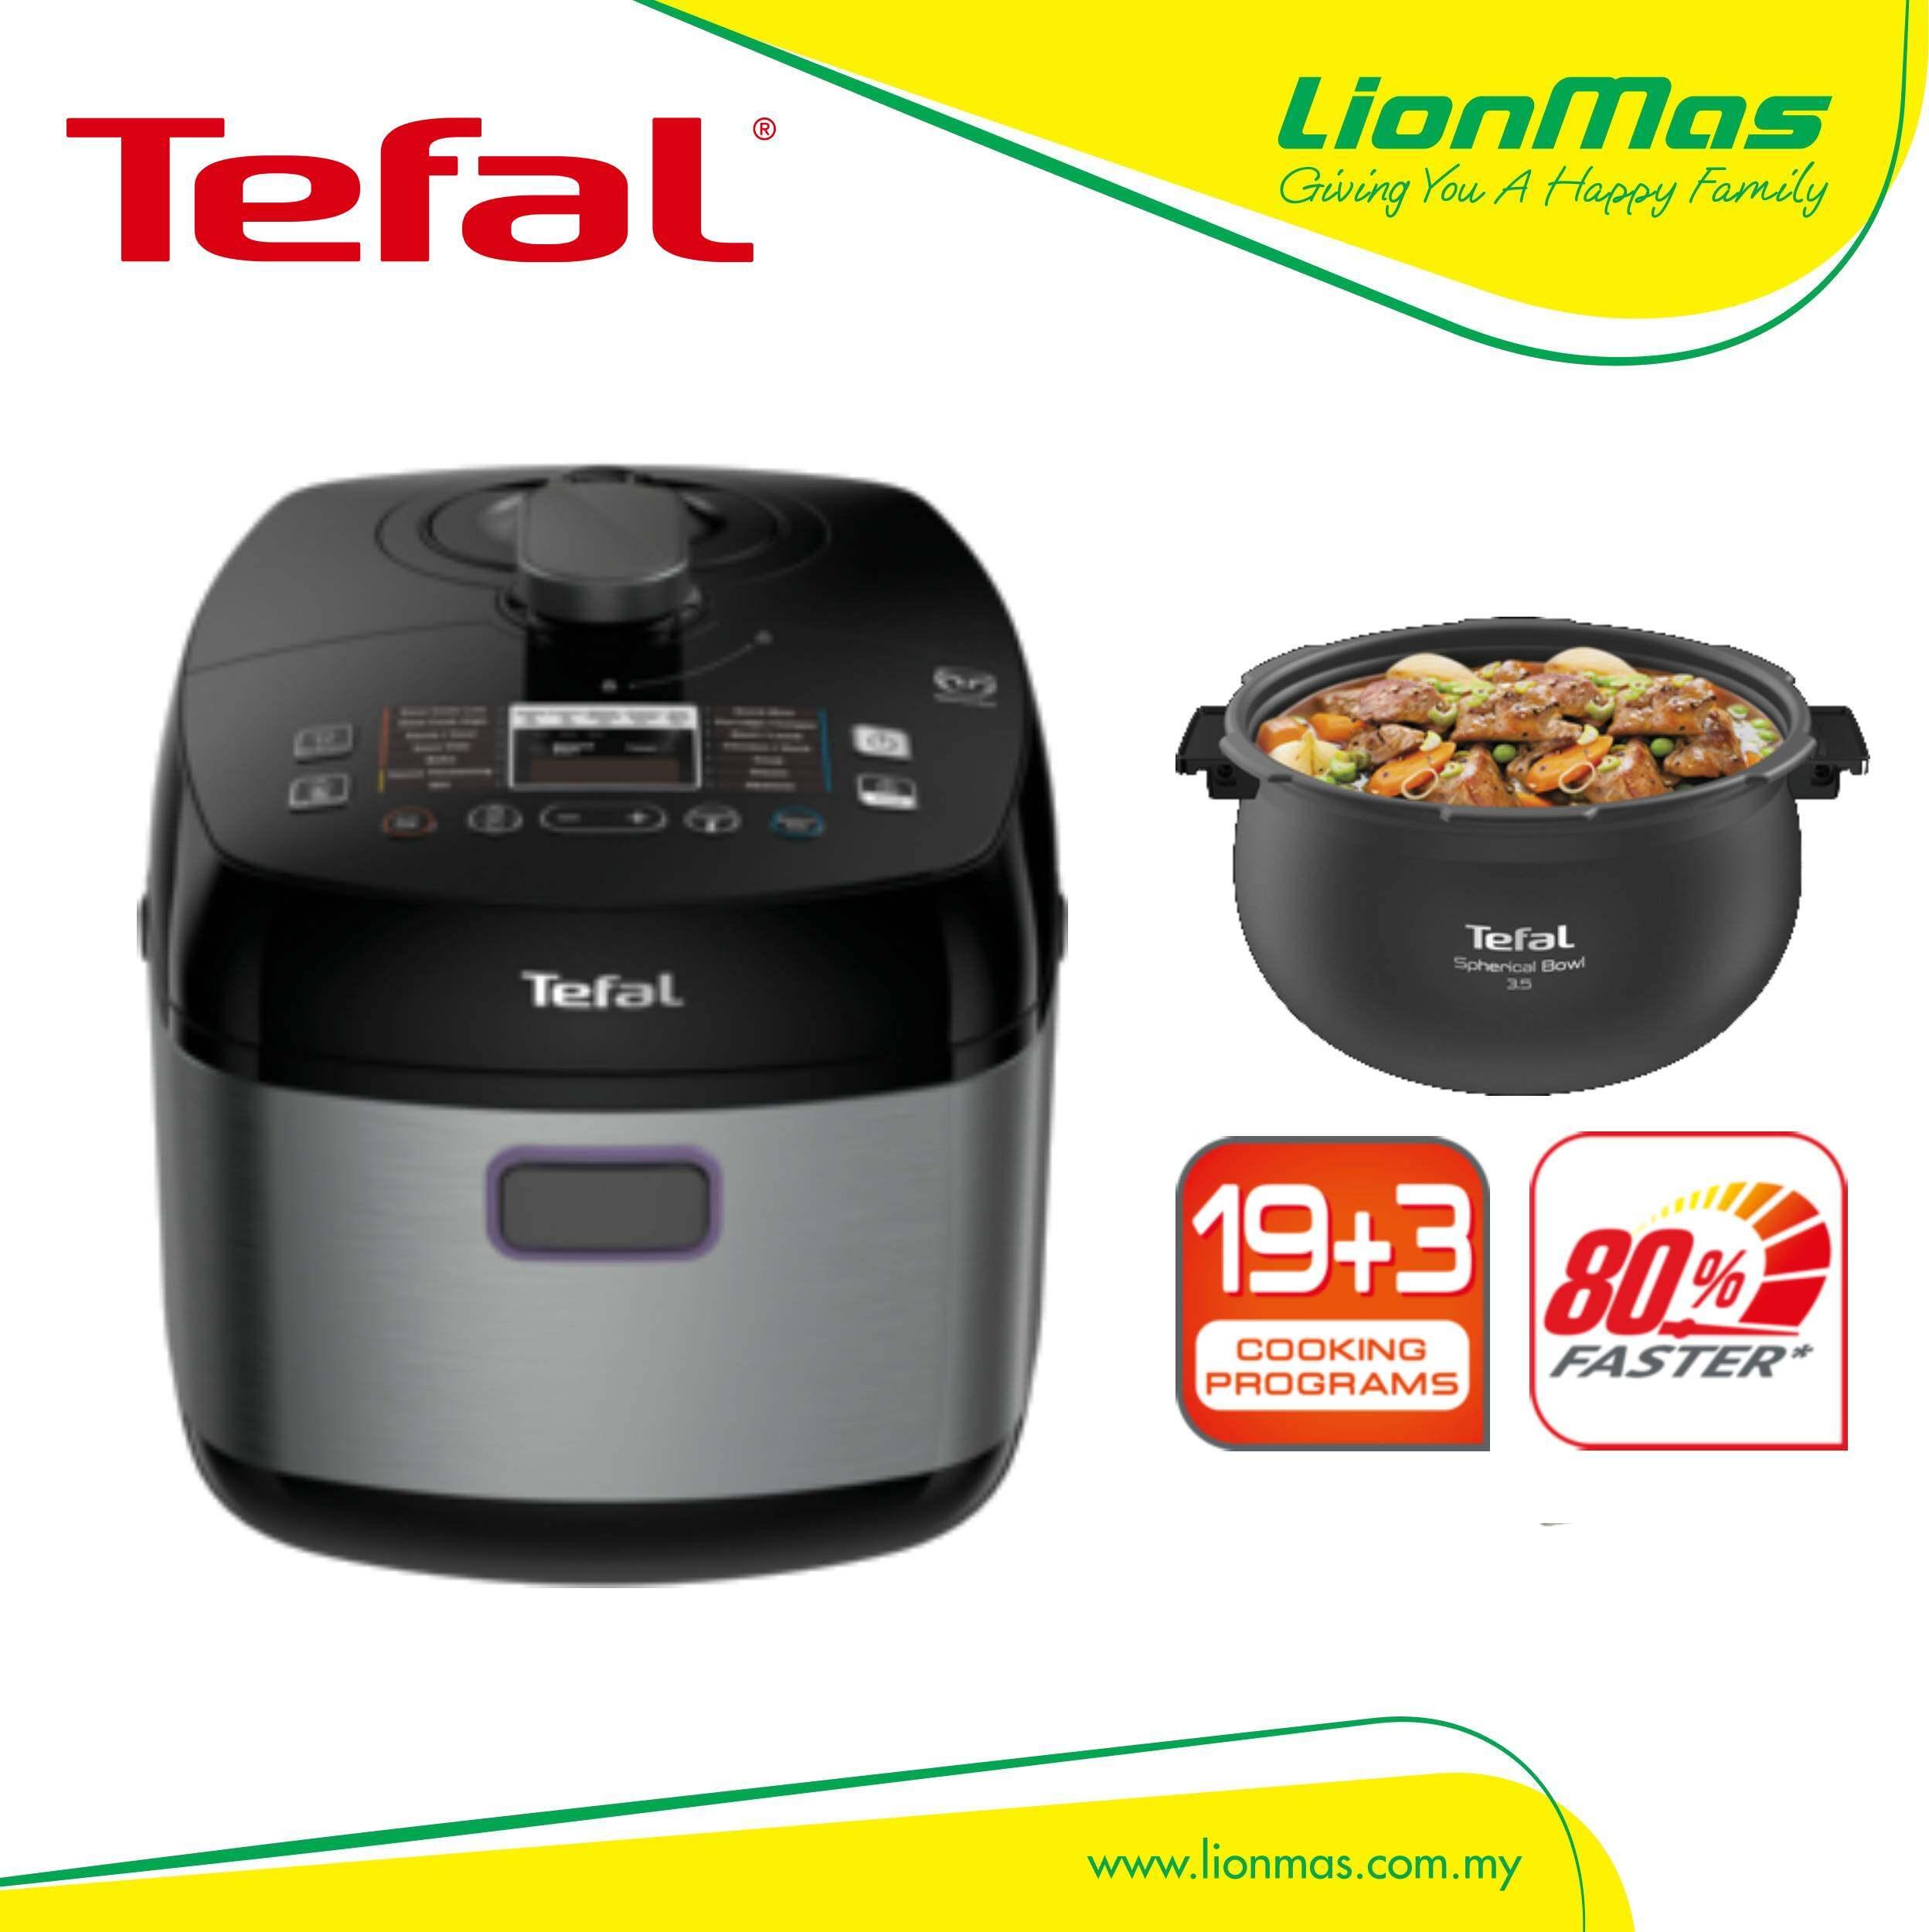 Tefal Home Chef Smart Pro Multicooker Pressure Cooker Cy625d Lazada